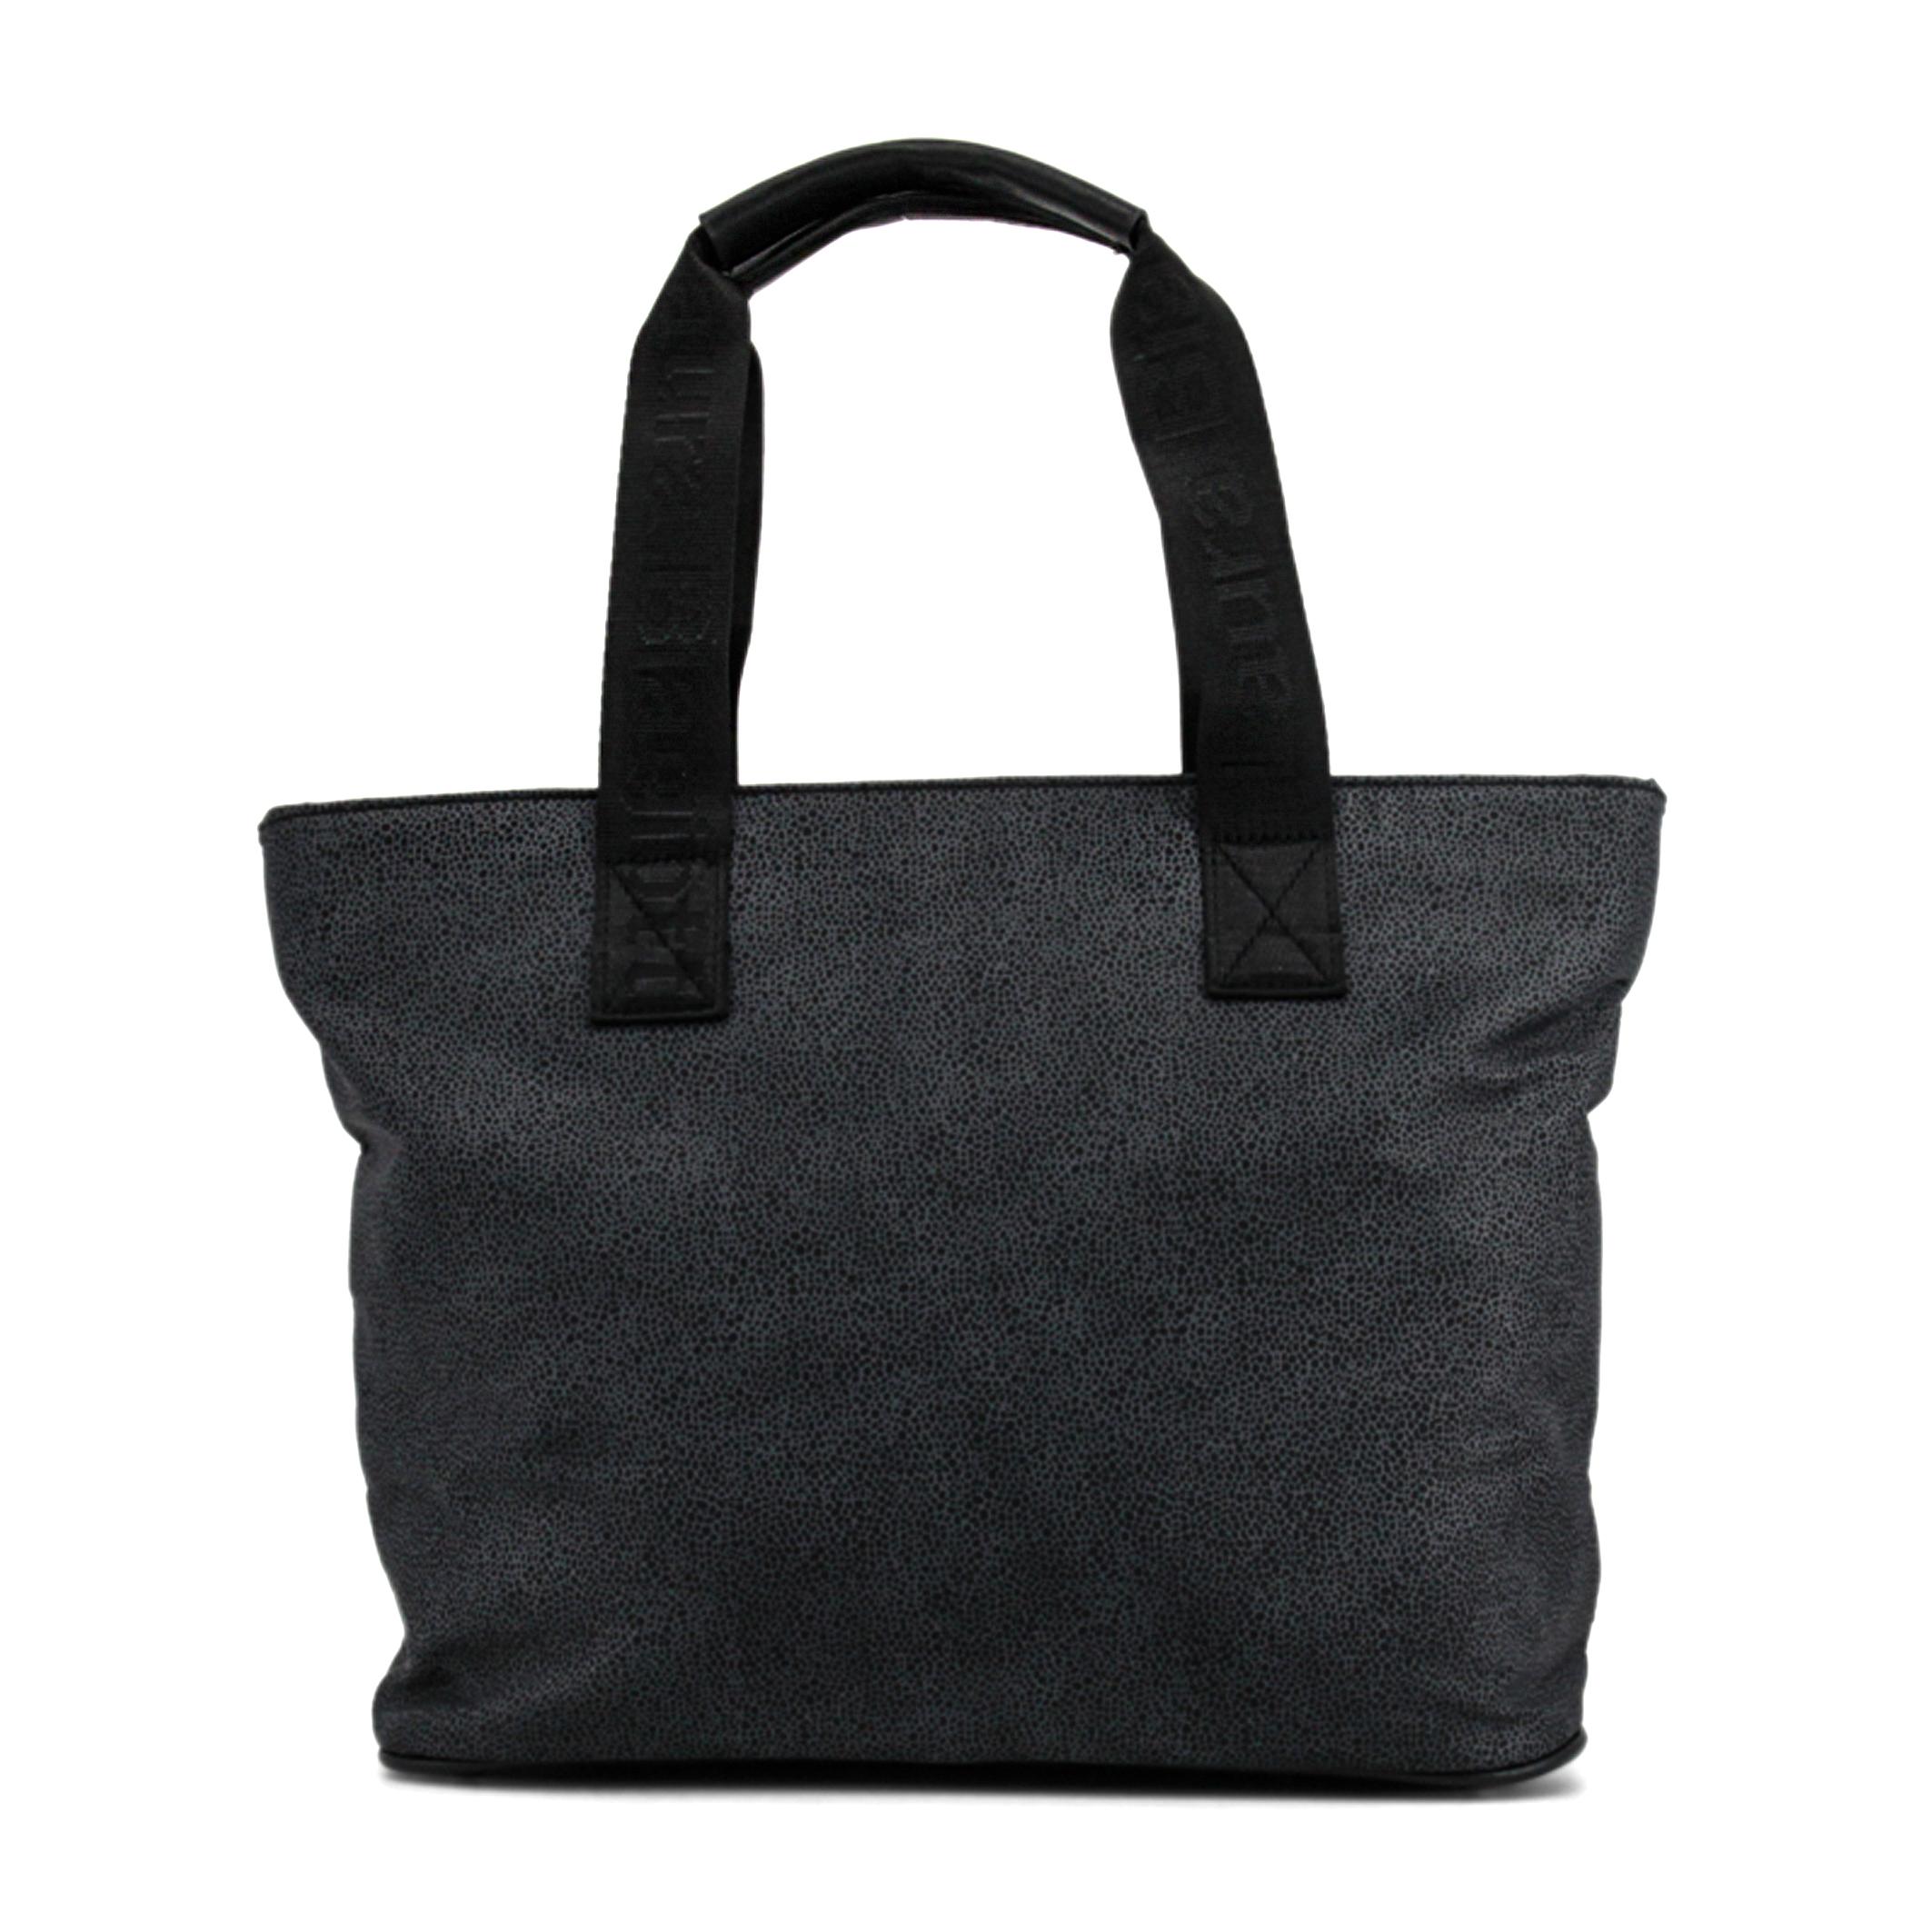 Shopping bag Laura Biagiotti LB18S103-4 Donna Nero 86142